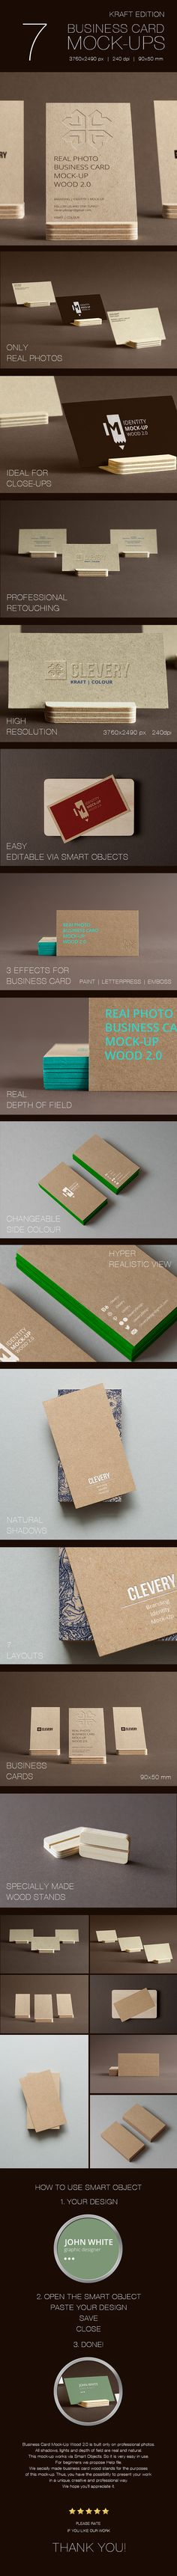 Freebie – Hipster Business Card PSD Template #businesscard #freebies ...